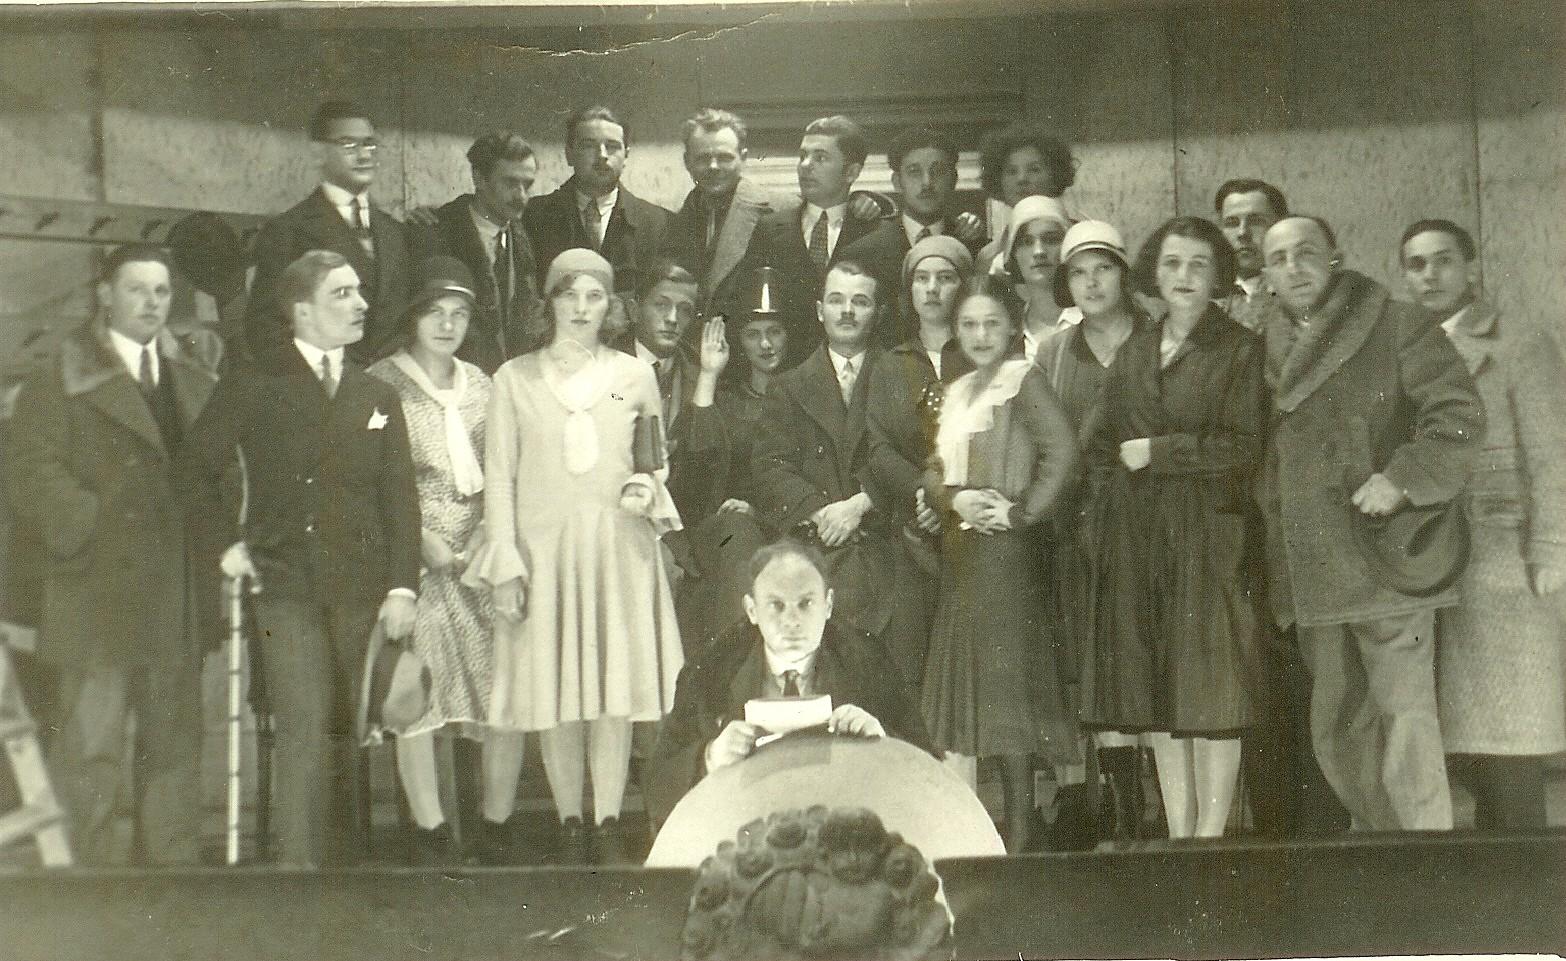 Divadelná hra z roku 1930. Na šepkárskej bude Lévay.